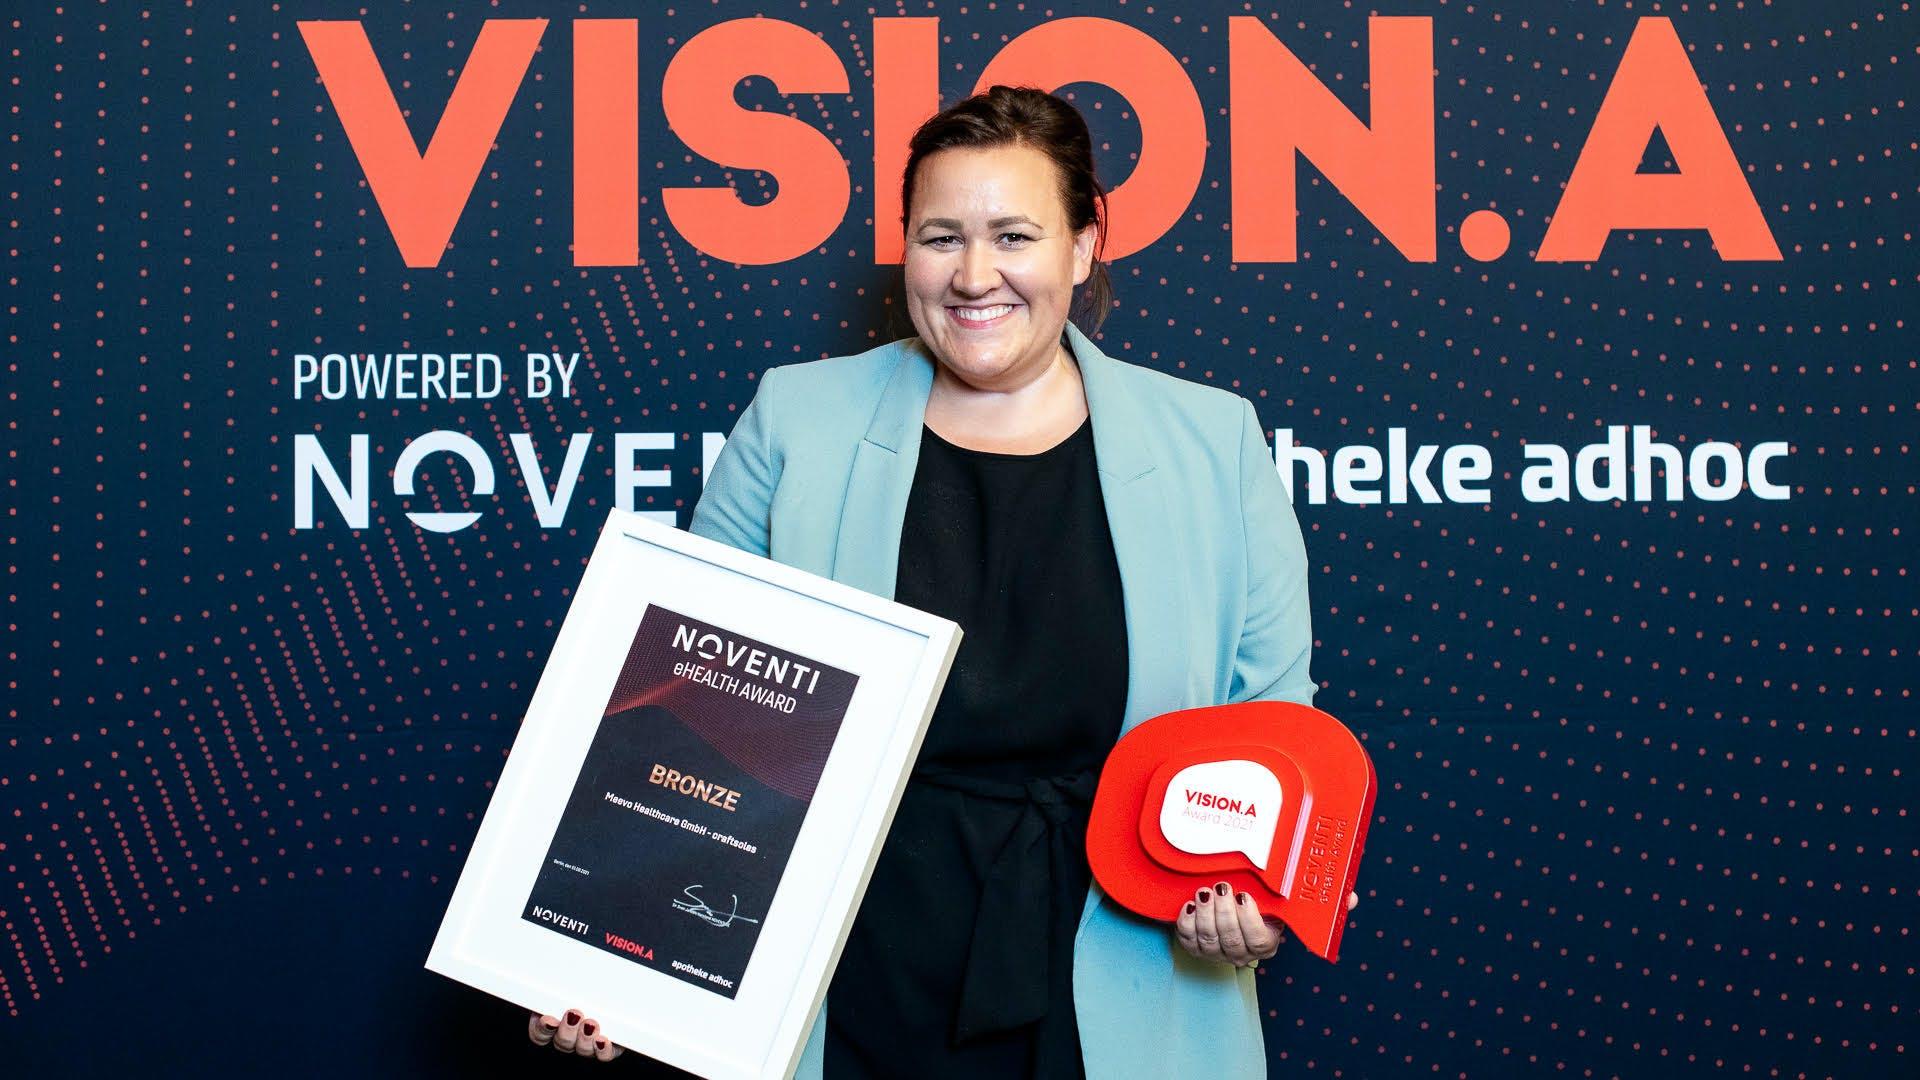 Vision.A Award Arlett Chlupka